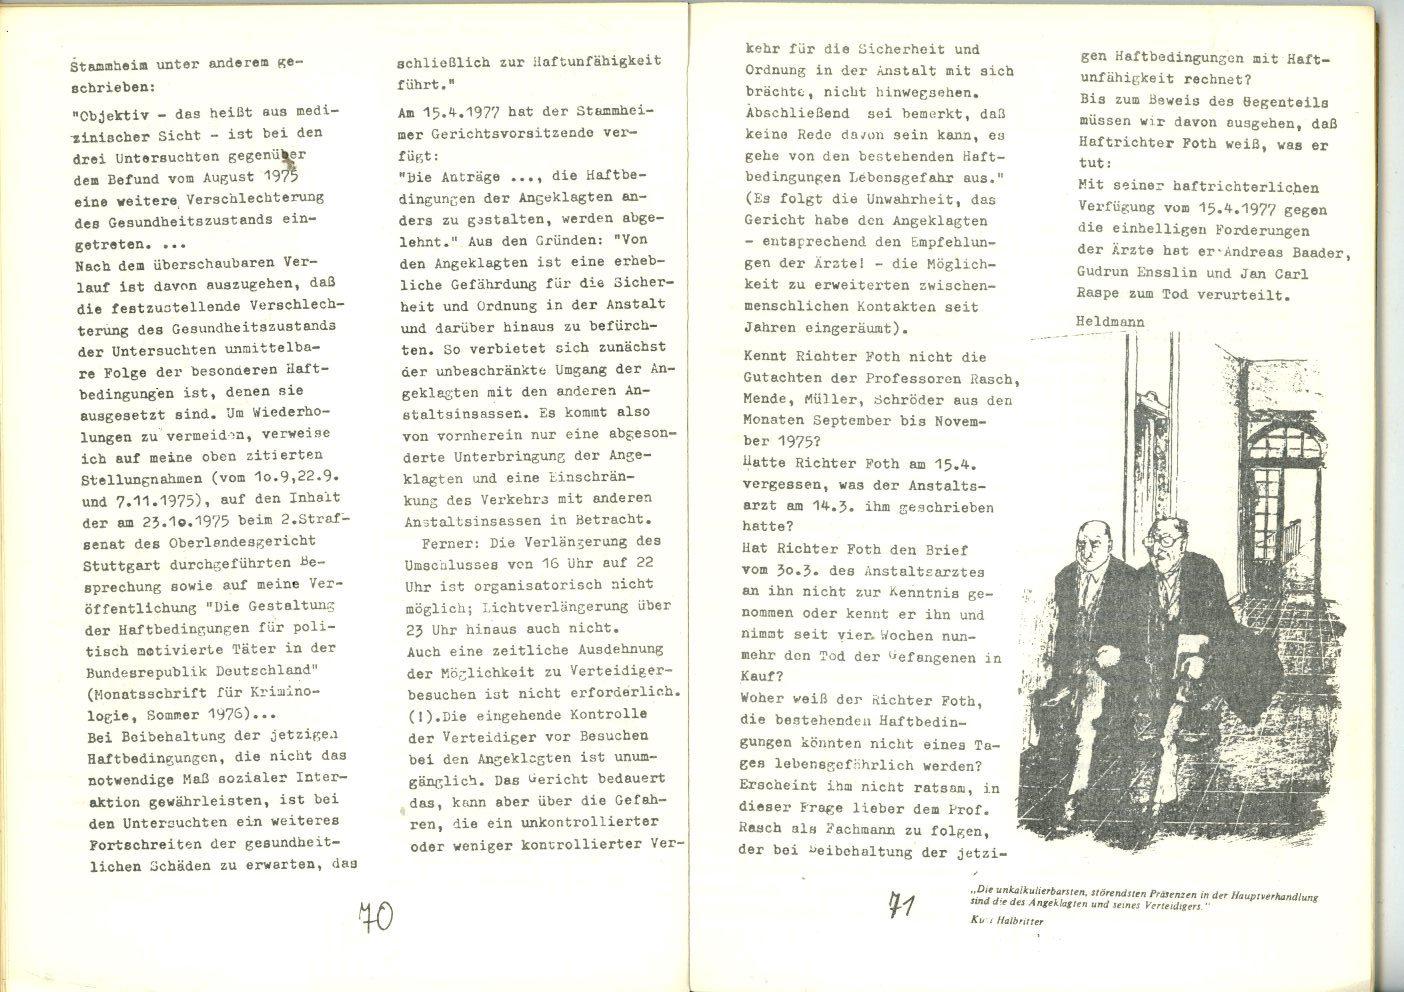 Marburg_Russell_Initiative_1978_37